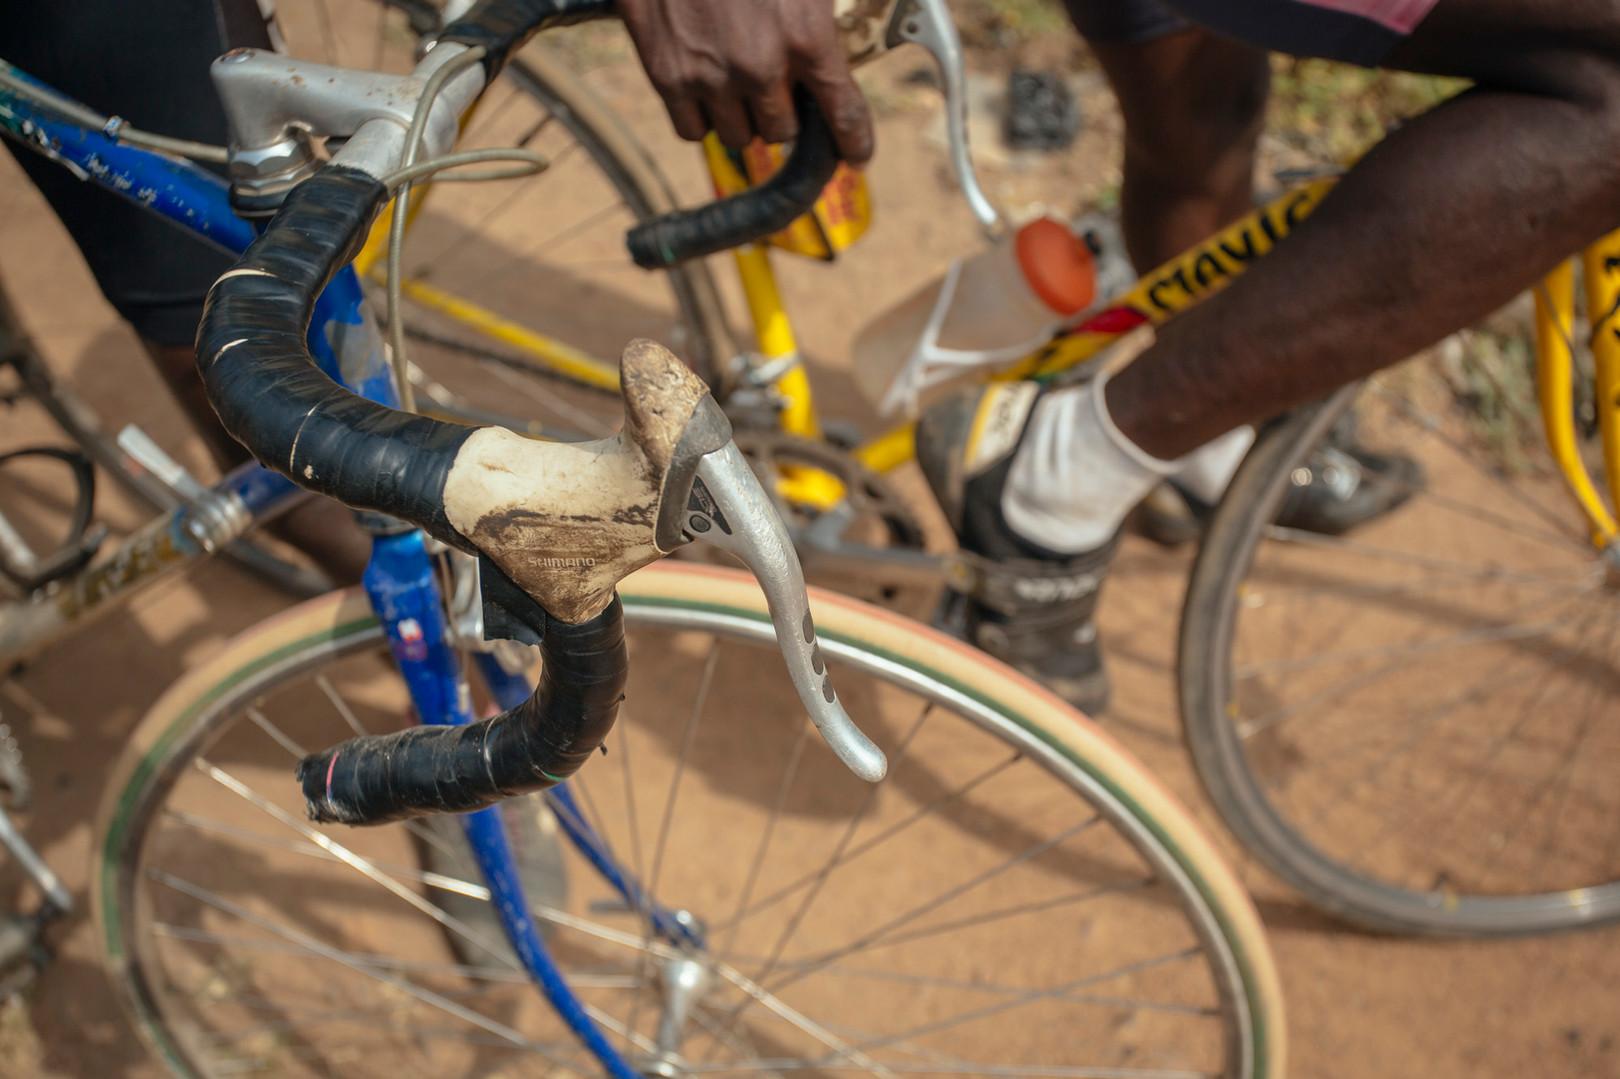 0222_Togo_KpaliméCyclingProject_20151220